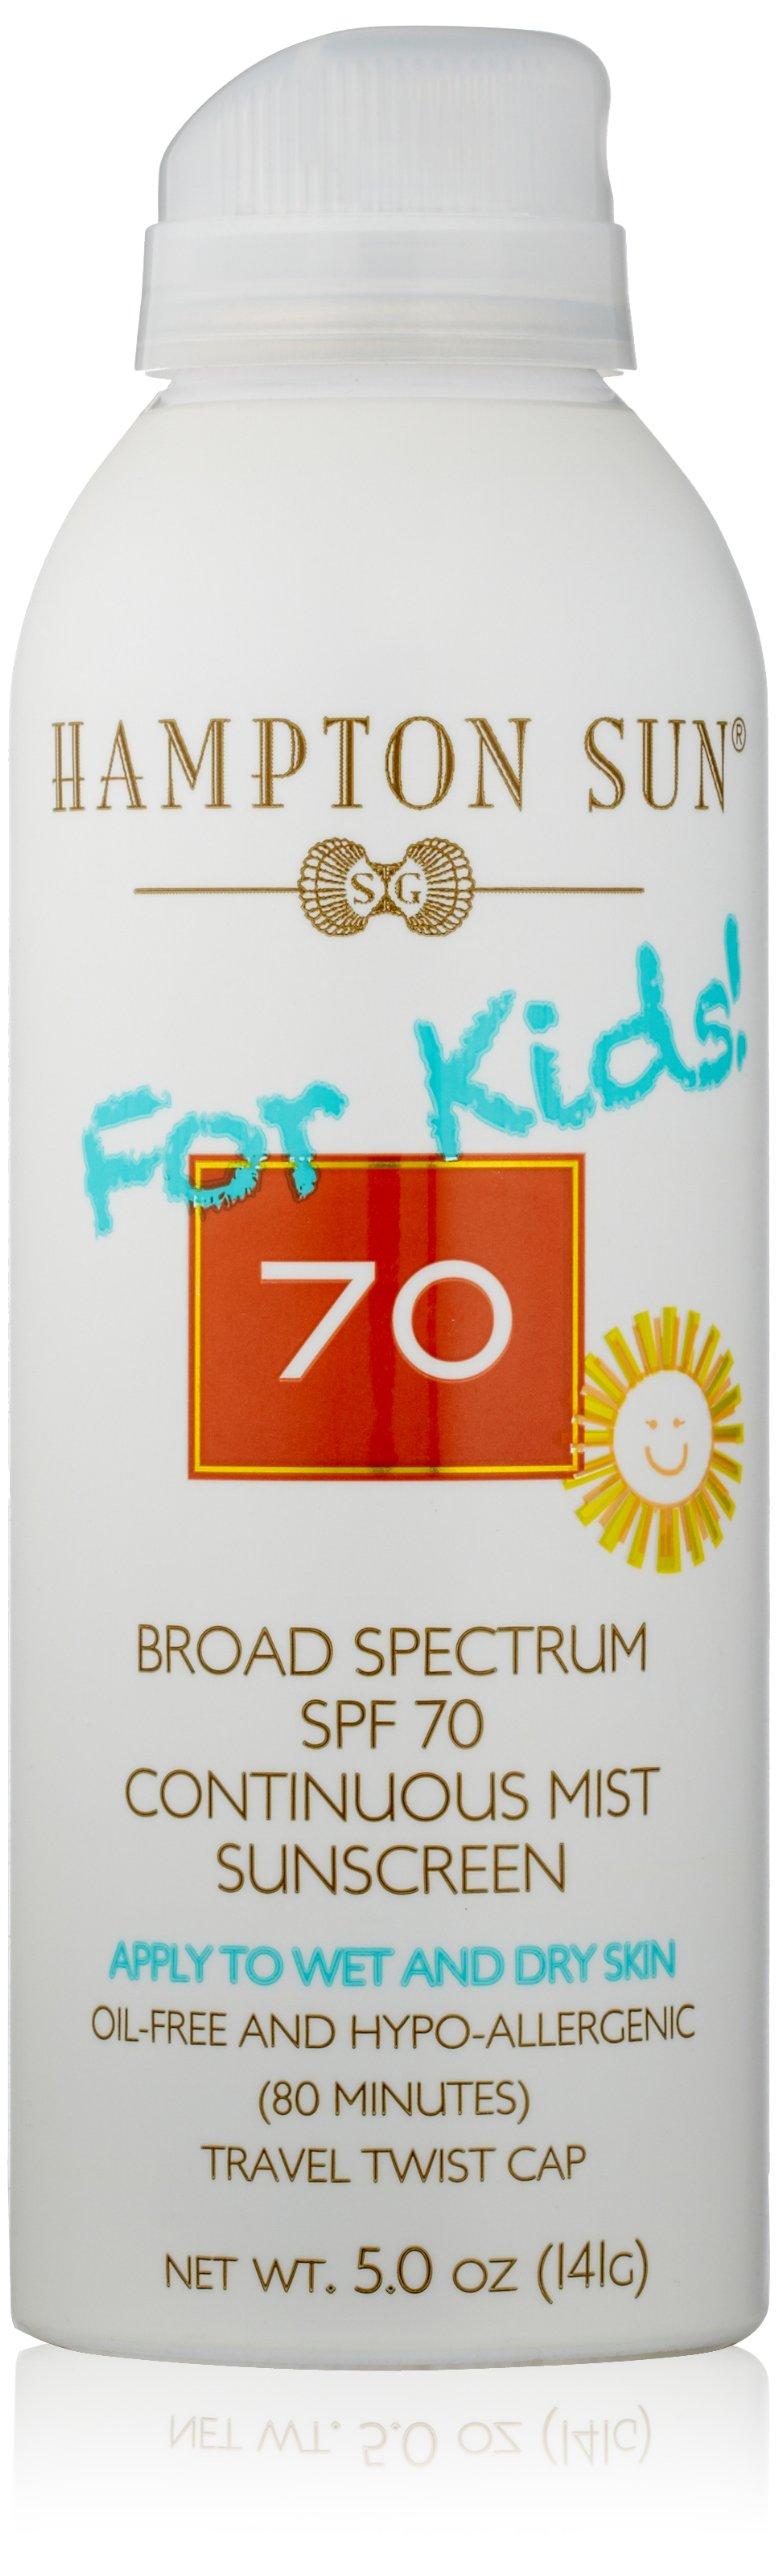 Hampton Sun SPF 70 for Kids Continuous Mist Sunscreen, 5 Oz